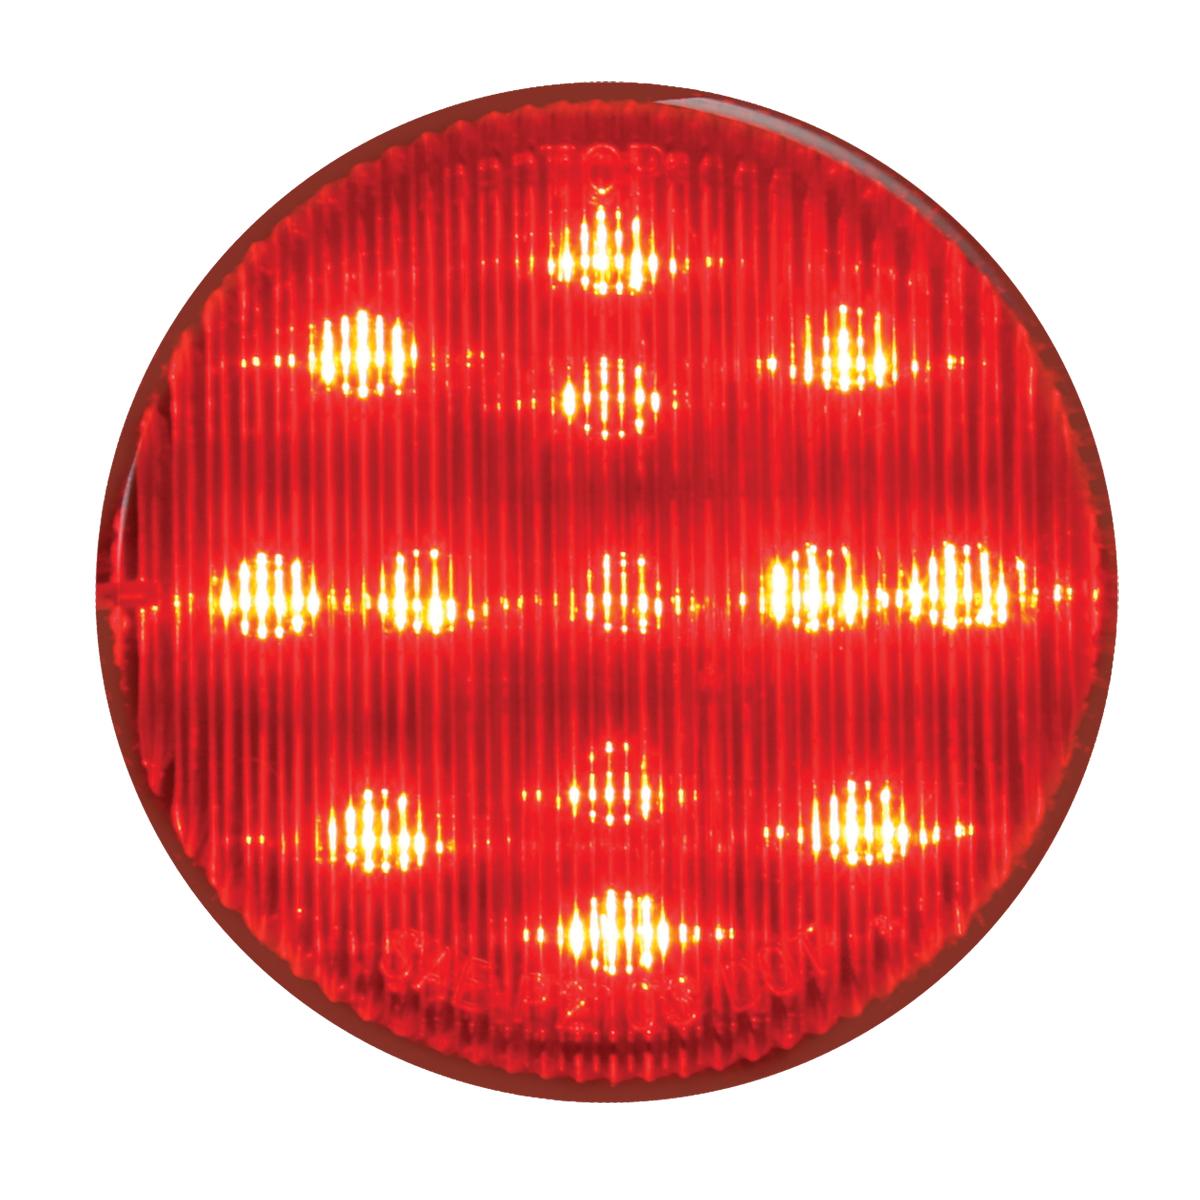 "79311 2-1/2"" Round Fleet Marker Light"